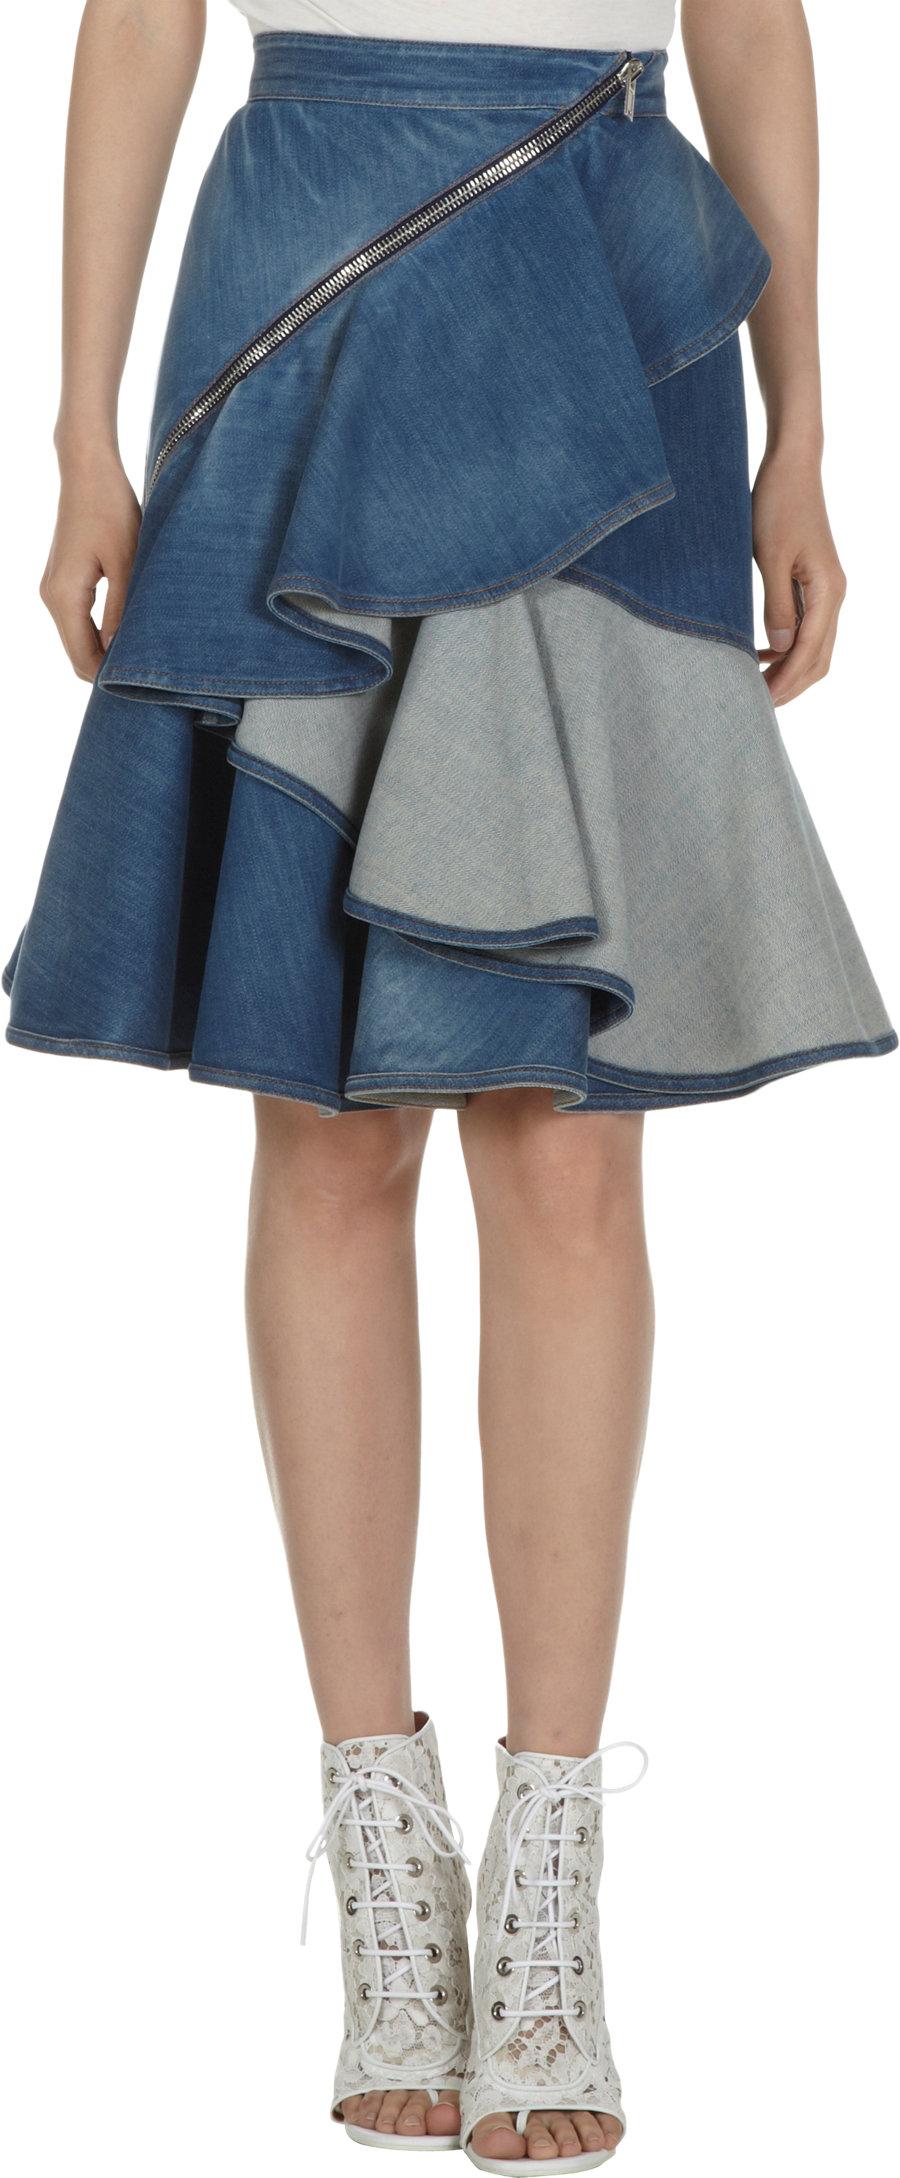 givenchy ruffled denim skirt in blue lyst